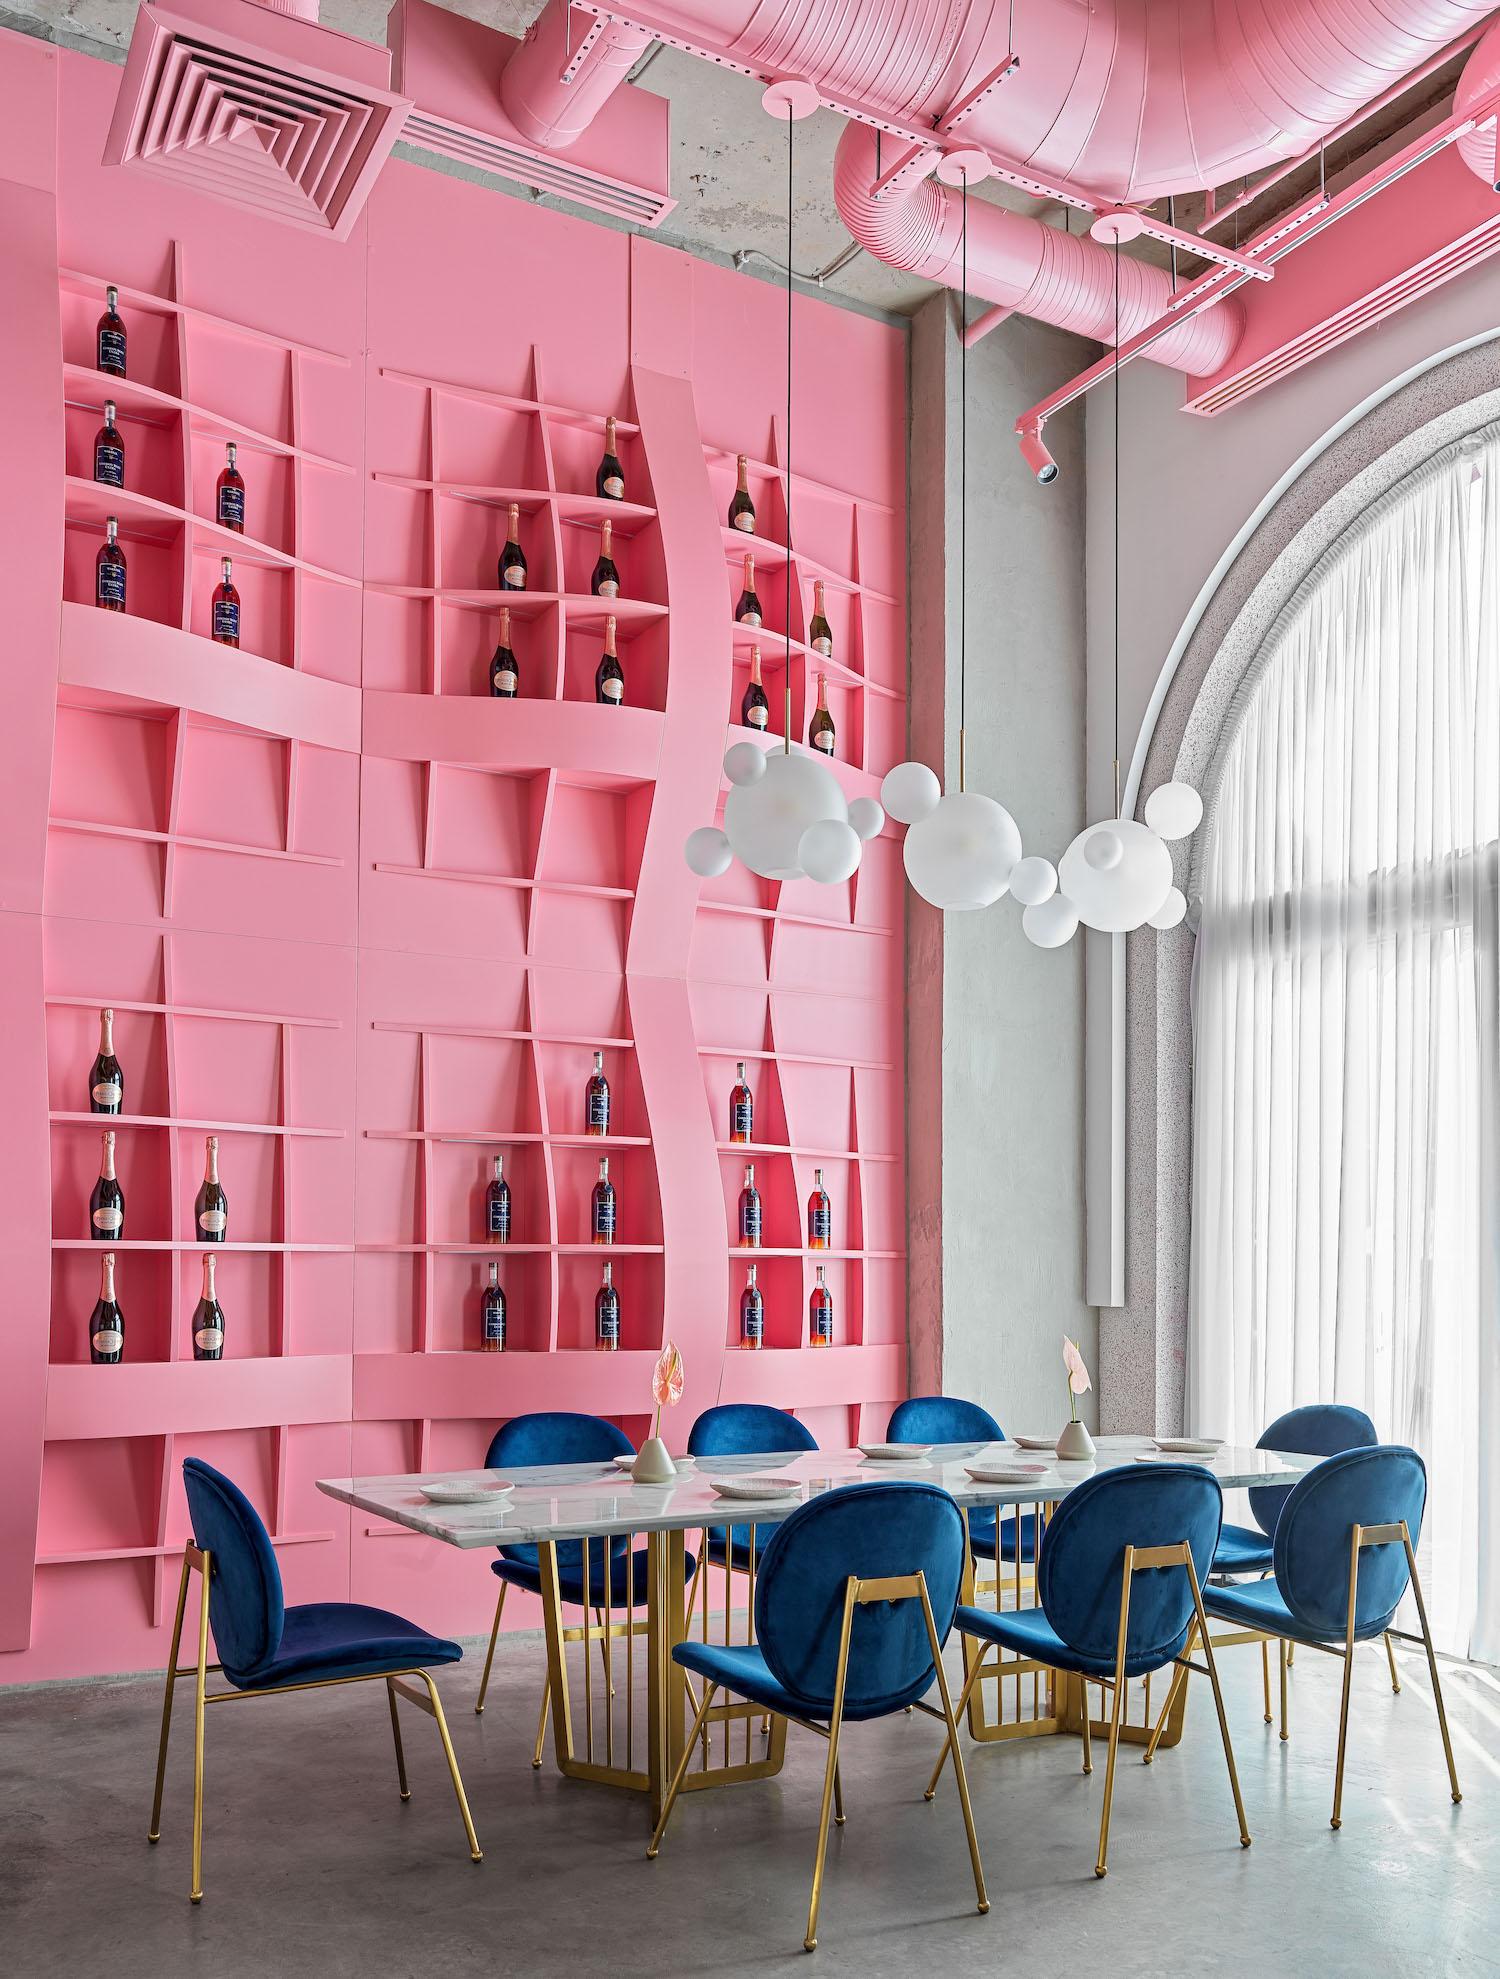 restaurant dining table near the pink shelves